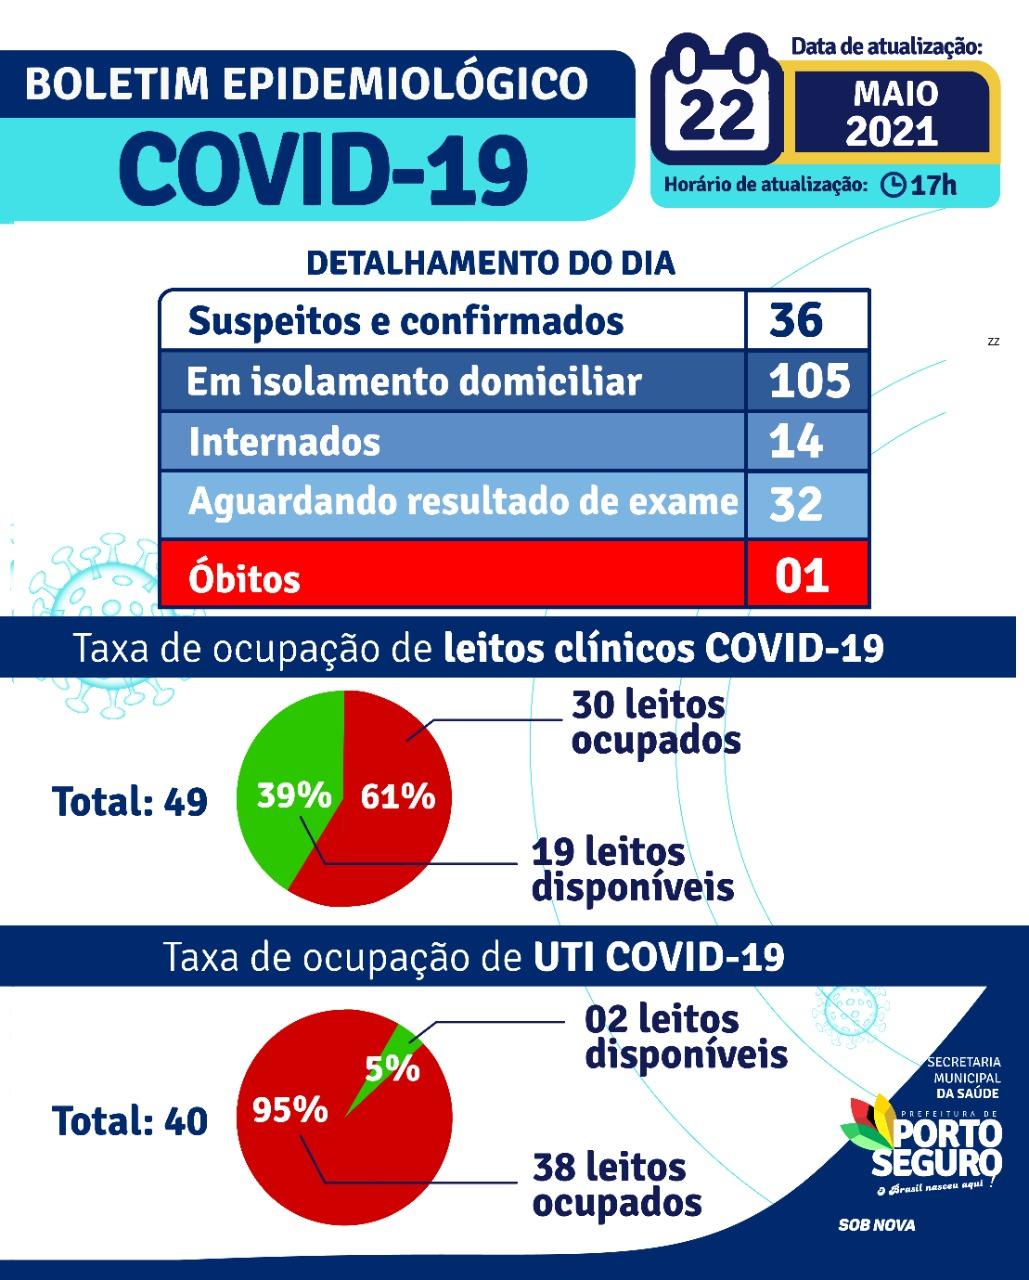 Porto Seguro: Boletim Epidemiológico Covid-19 (22/05/2021) 22